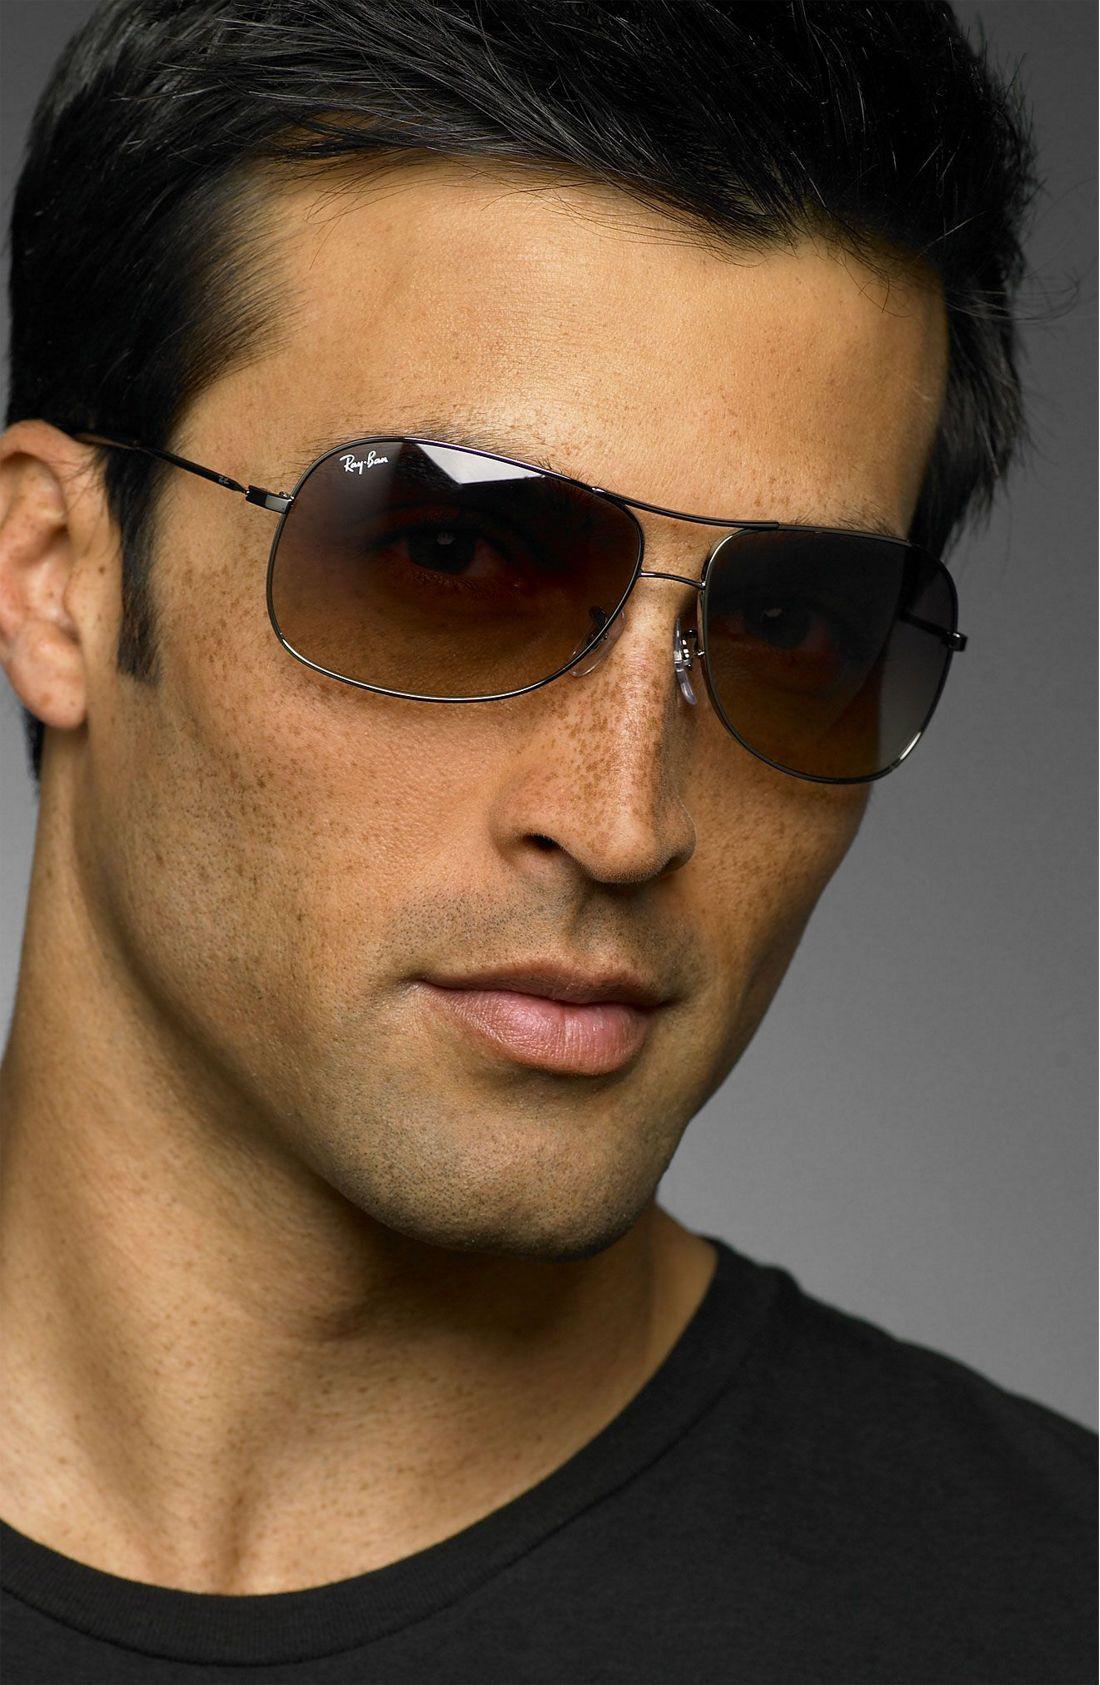 Ray Ban Metal Aviator Sunglasses  ray ban square aviators sunglasses money in the banana stand